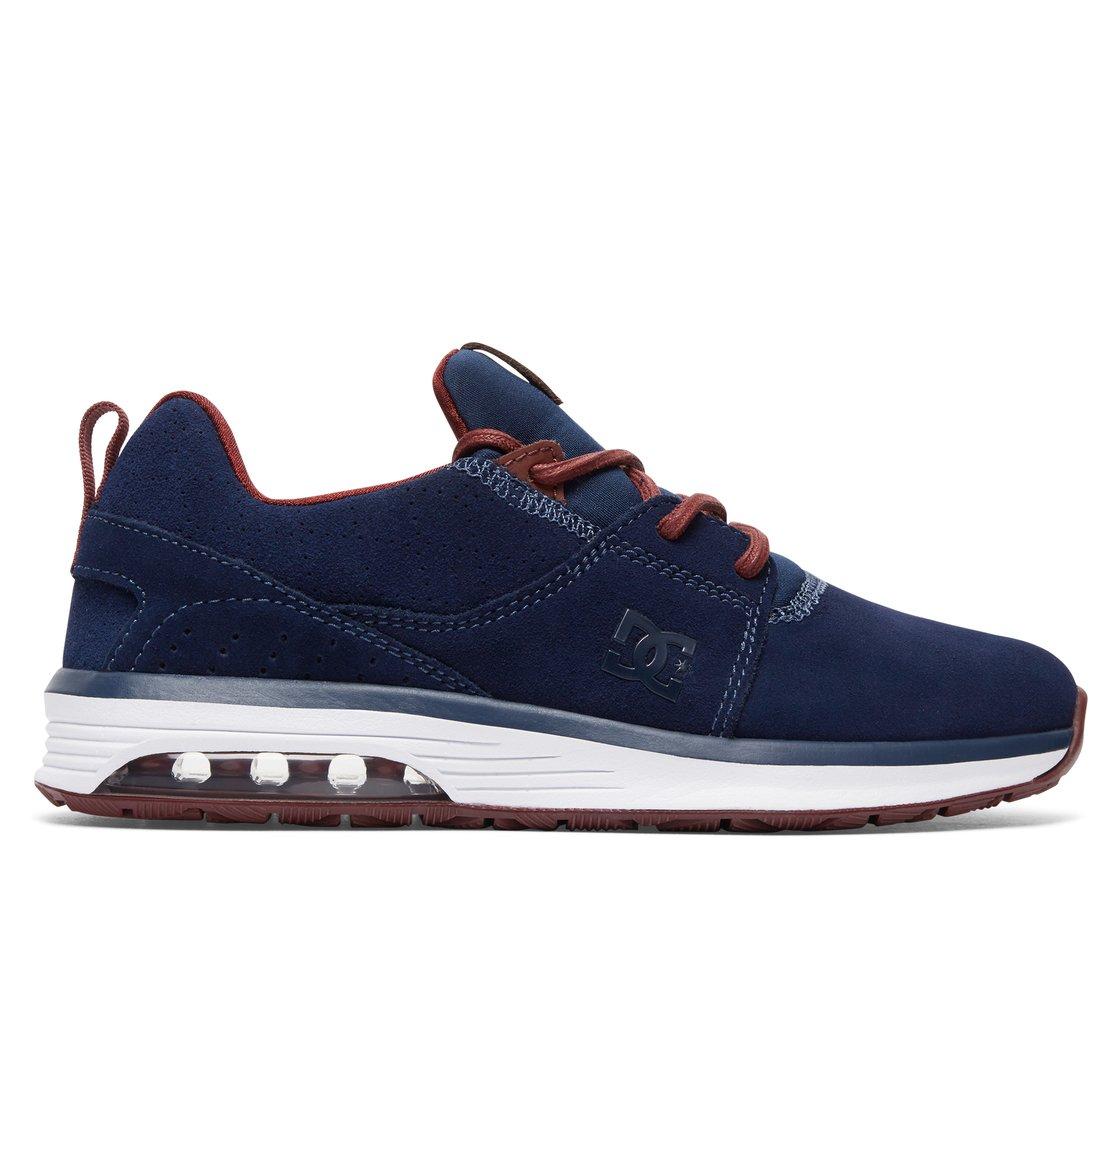 Chaussures de skate DC shoes Heathrow